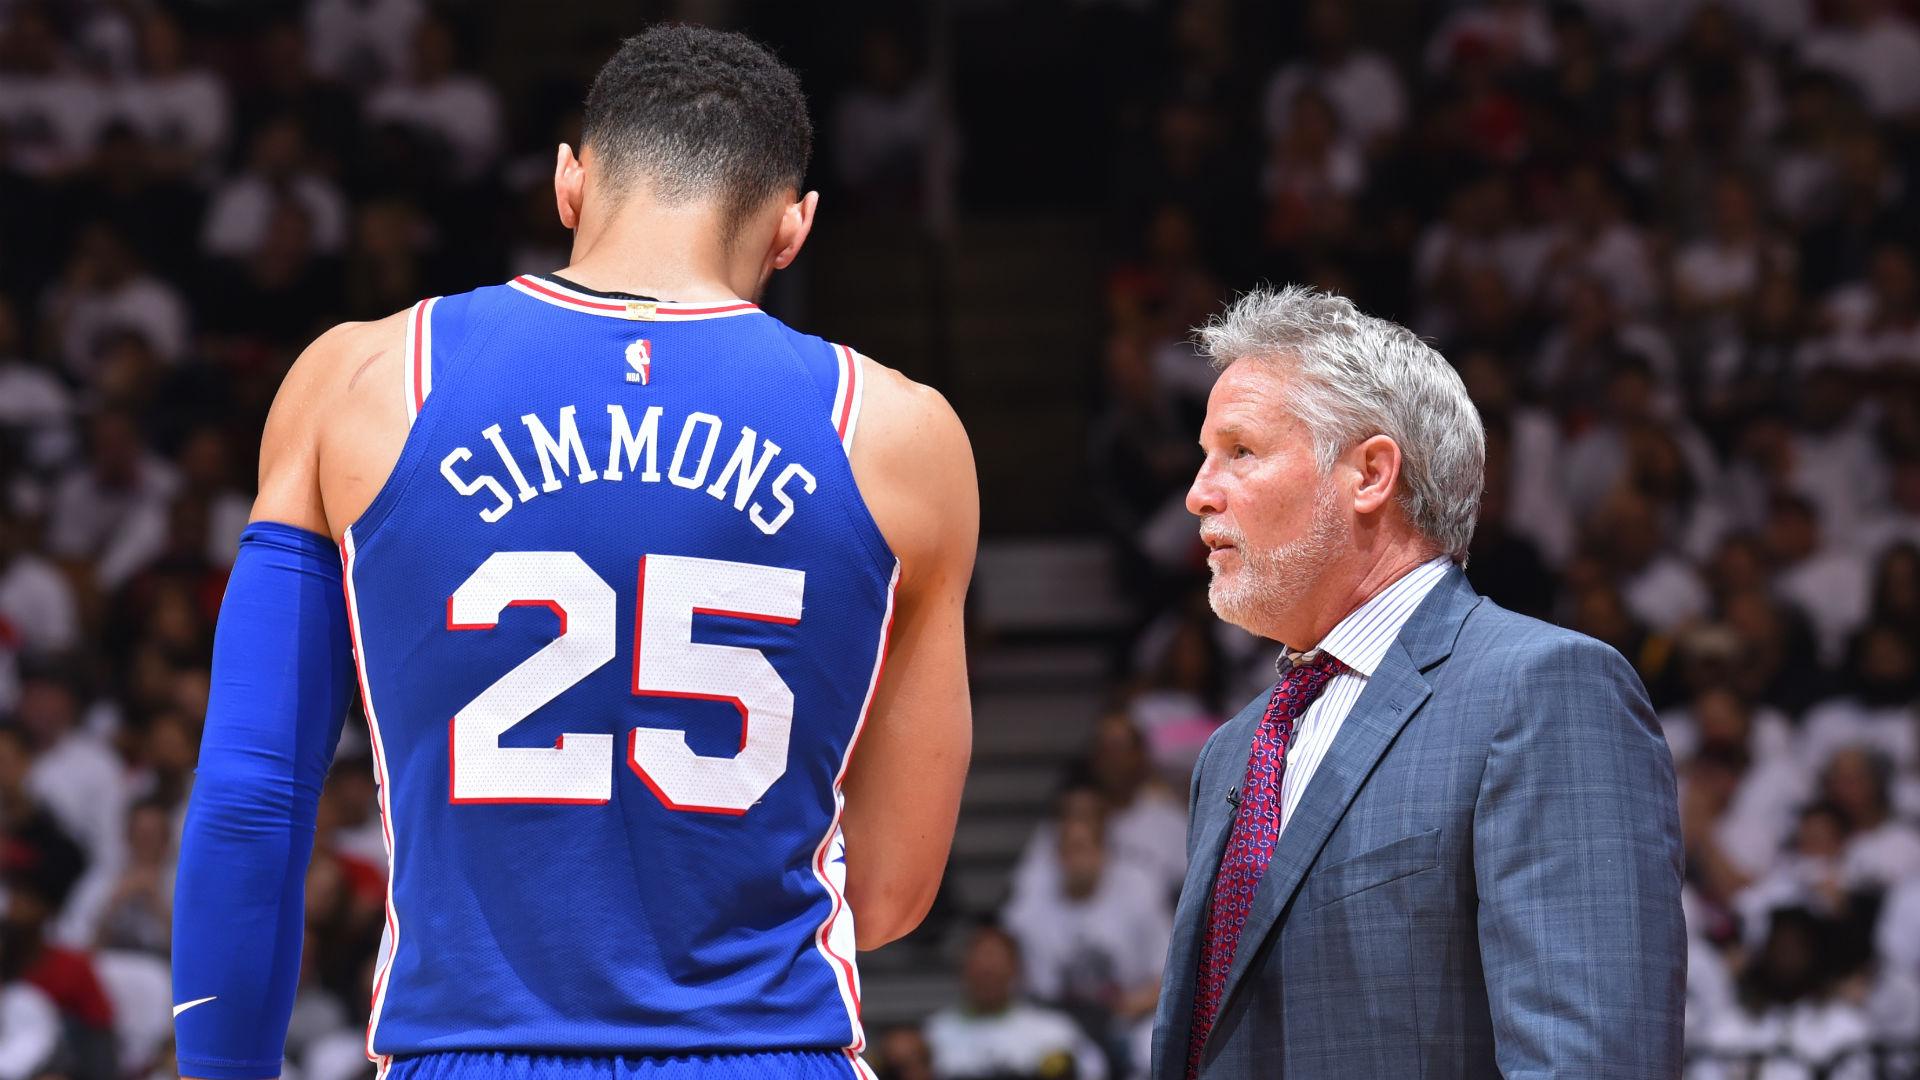 Report: Philadelphia 76ers' Brett Brown to become Australian Boomers National Team head coach